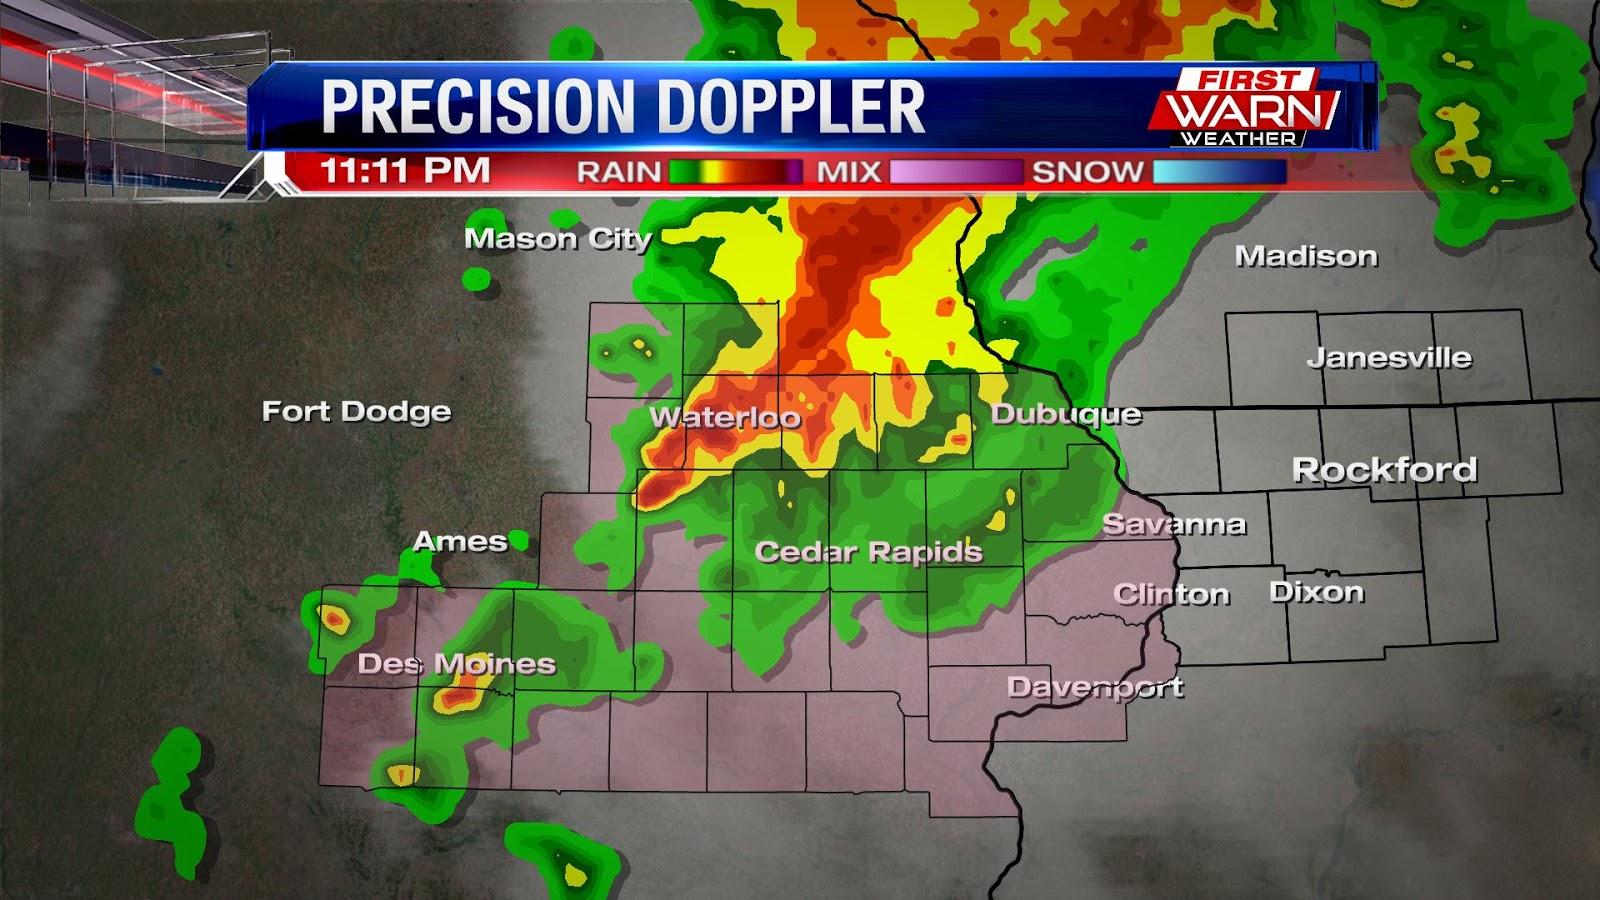 First Warn Weather Team: Wednesday Evening Storm Update